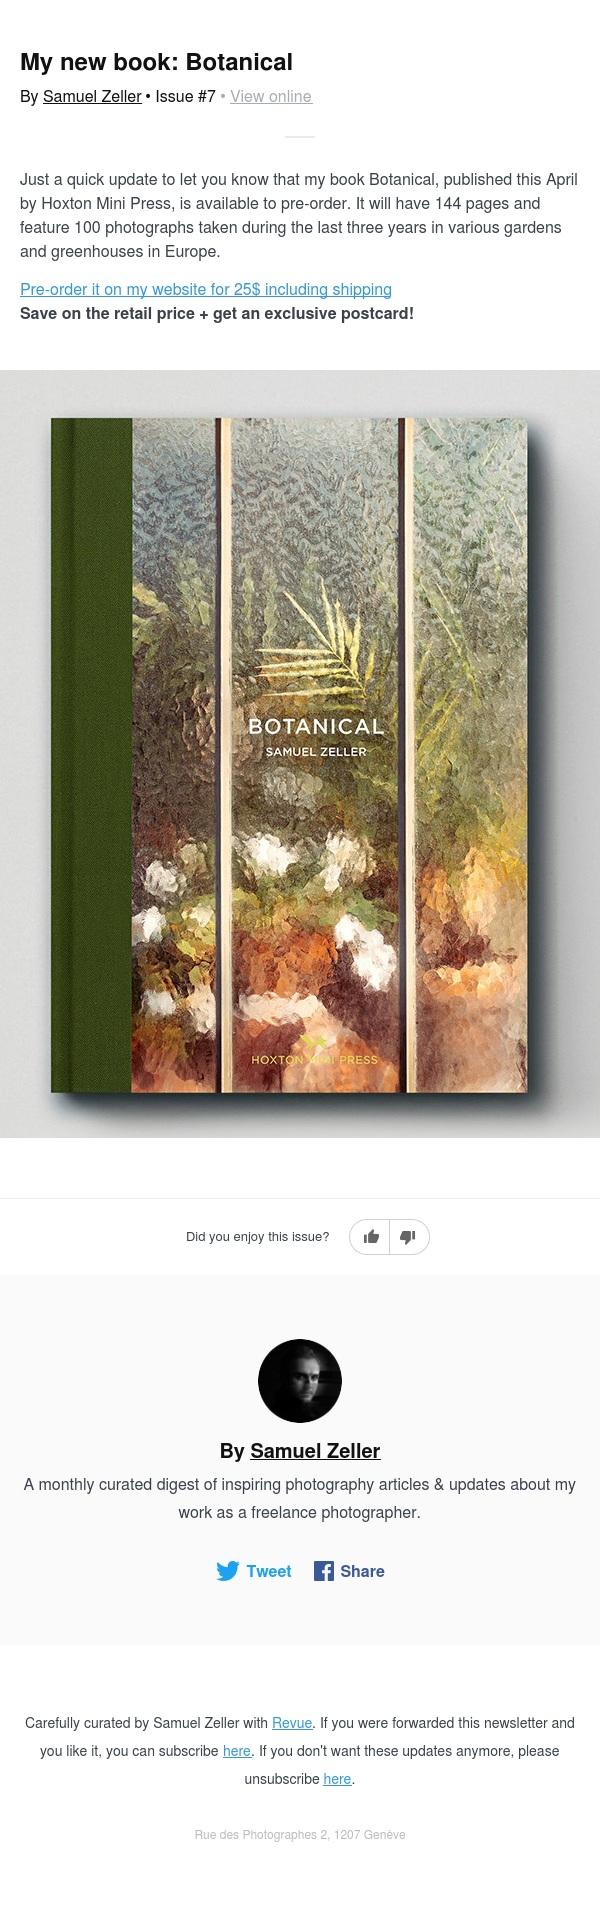 My new book: Botanical 🌿